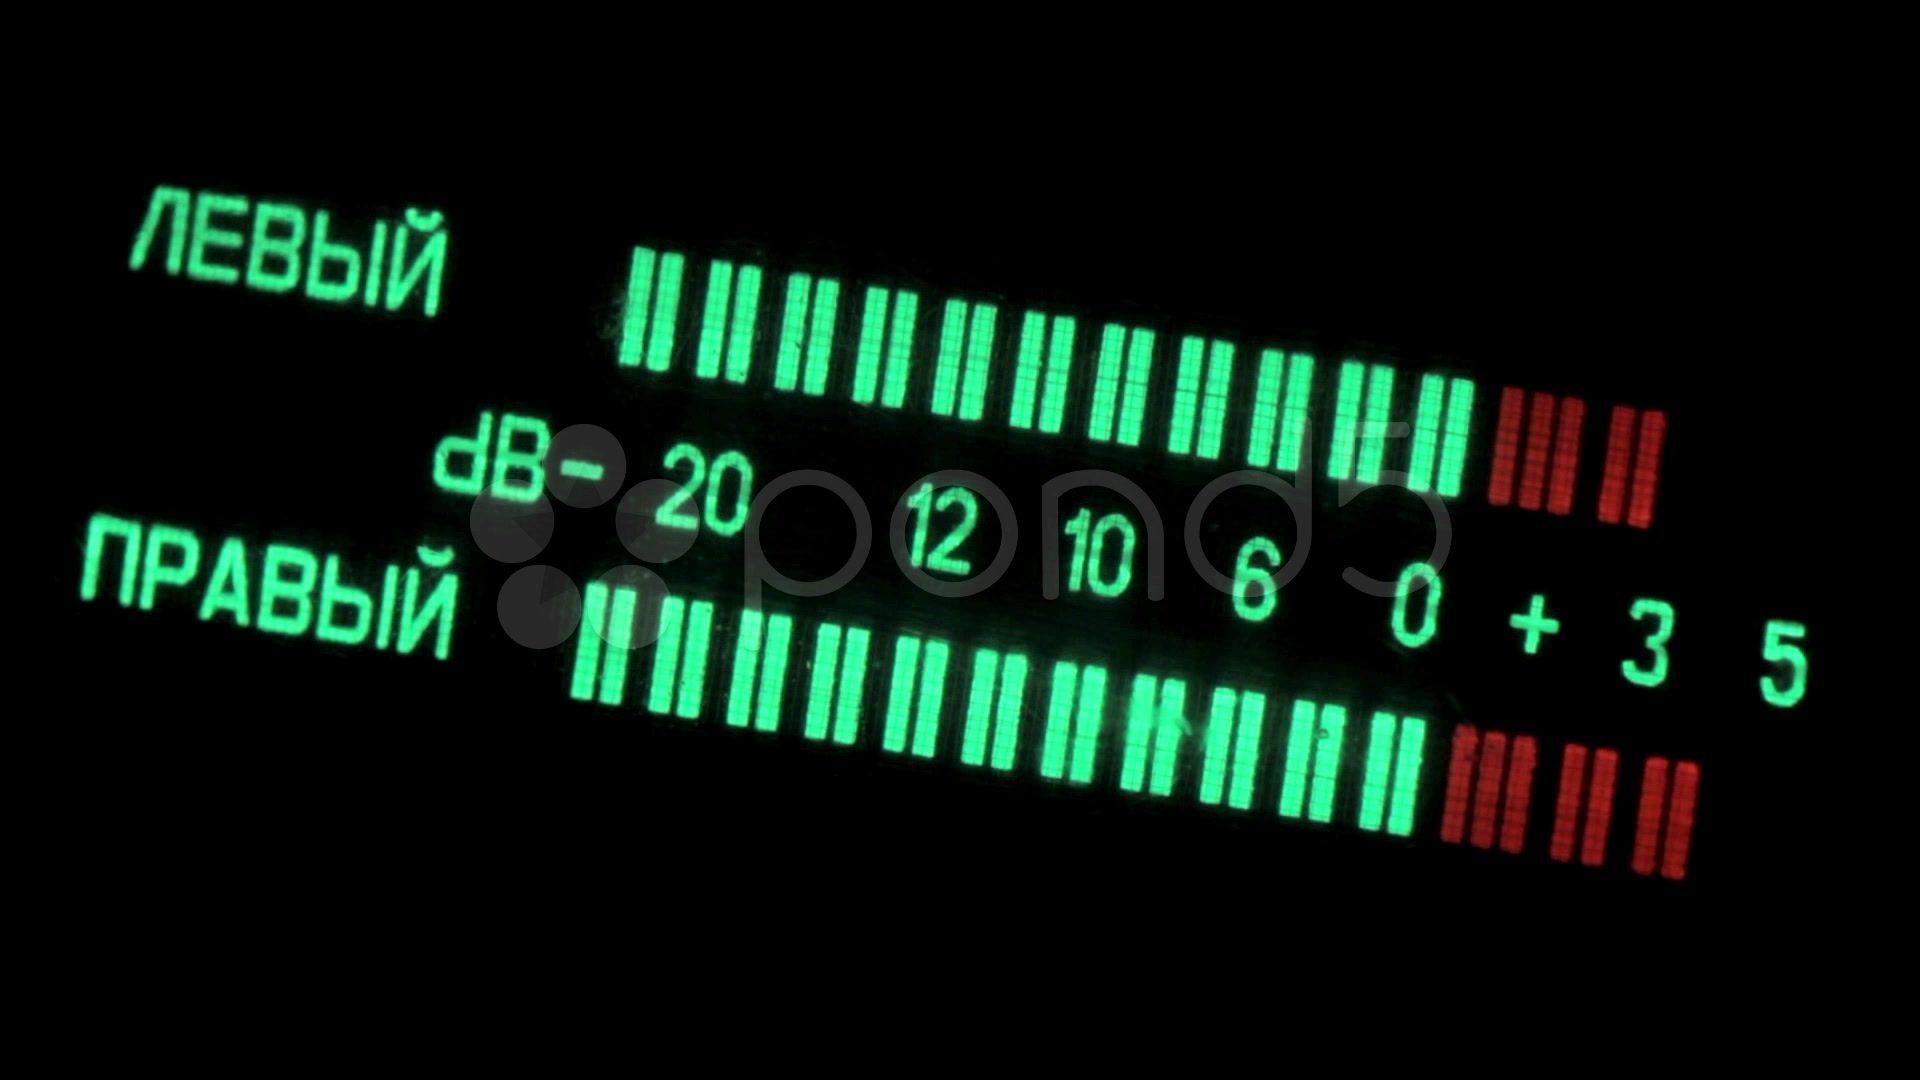 Led Vu Meter Vintage Hi Res Video 39341736 Old Tech In 2018 Audio